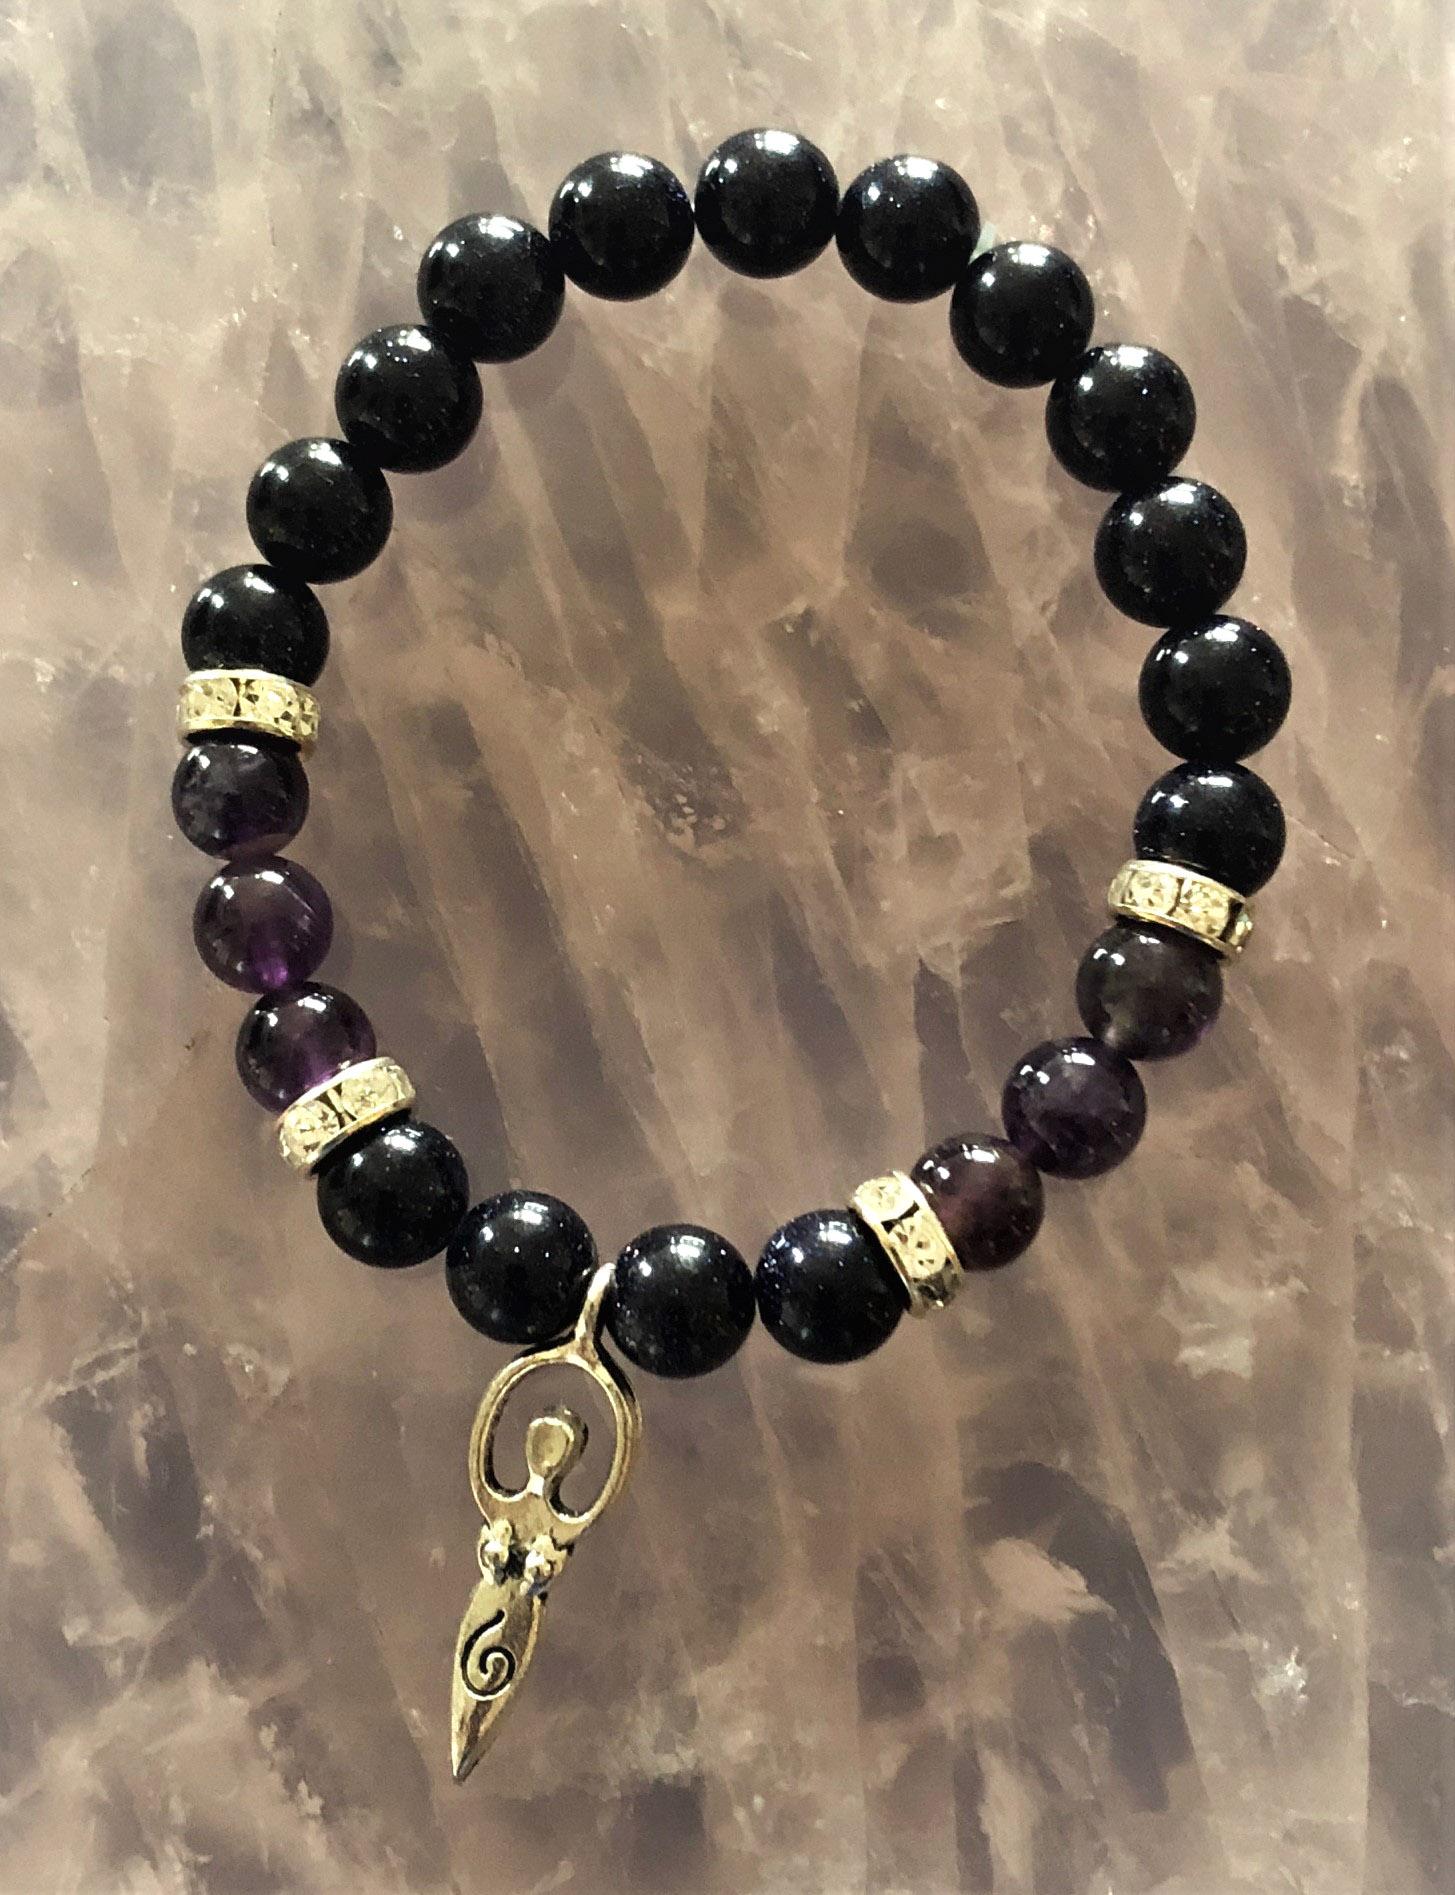 Ameythyst and purple goldstone bracelet with female charm